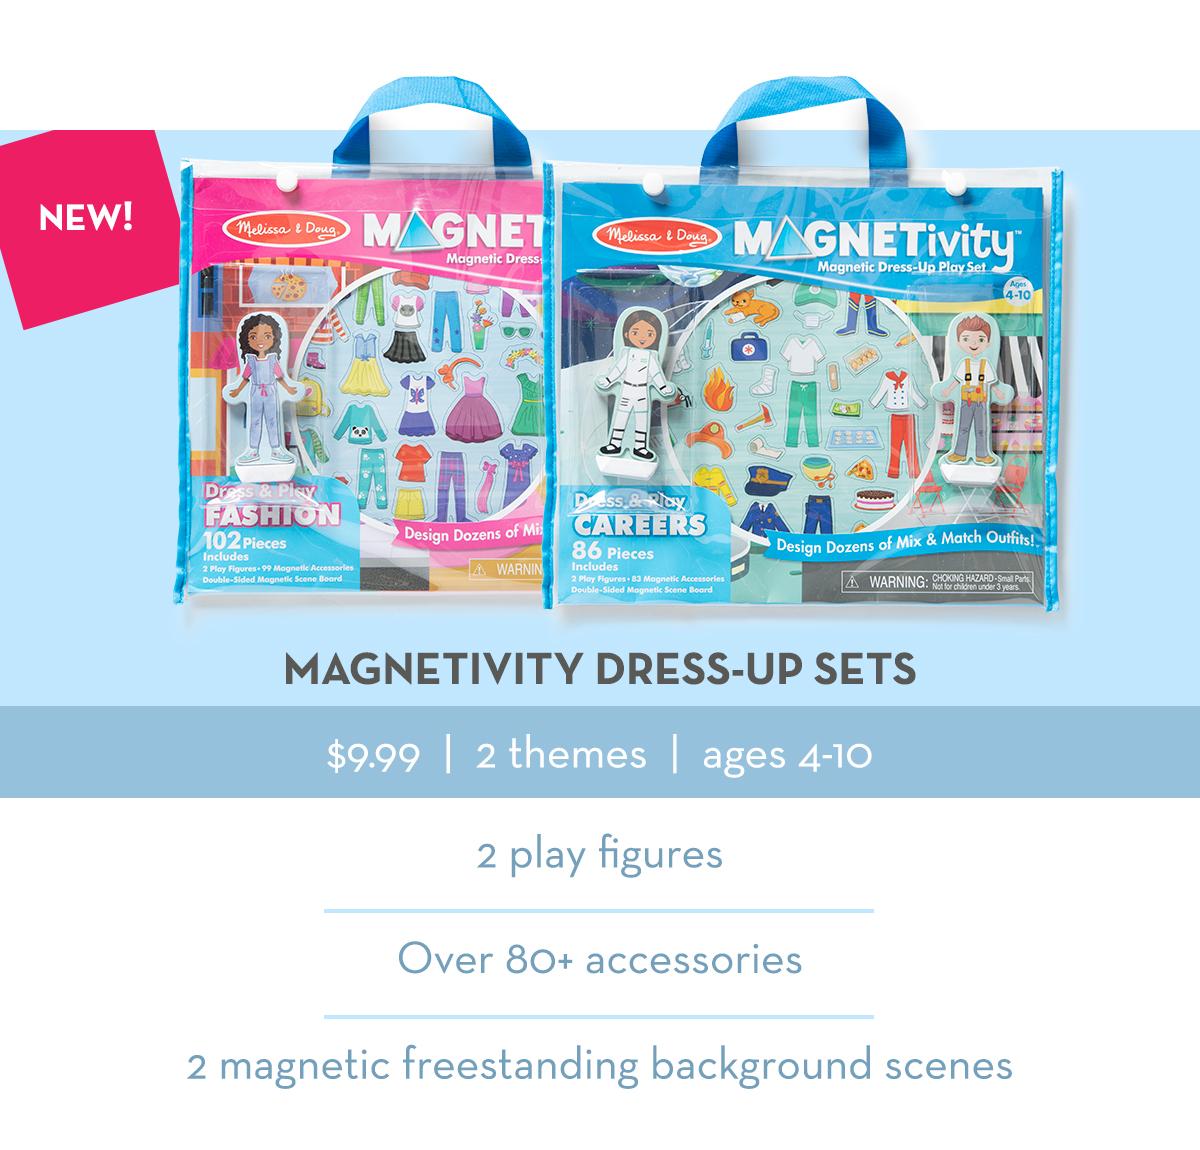 Magnetivity Dress-Up Sets